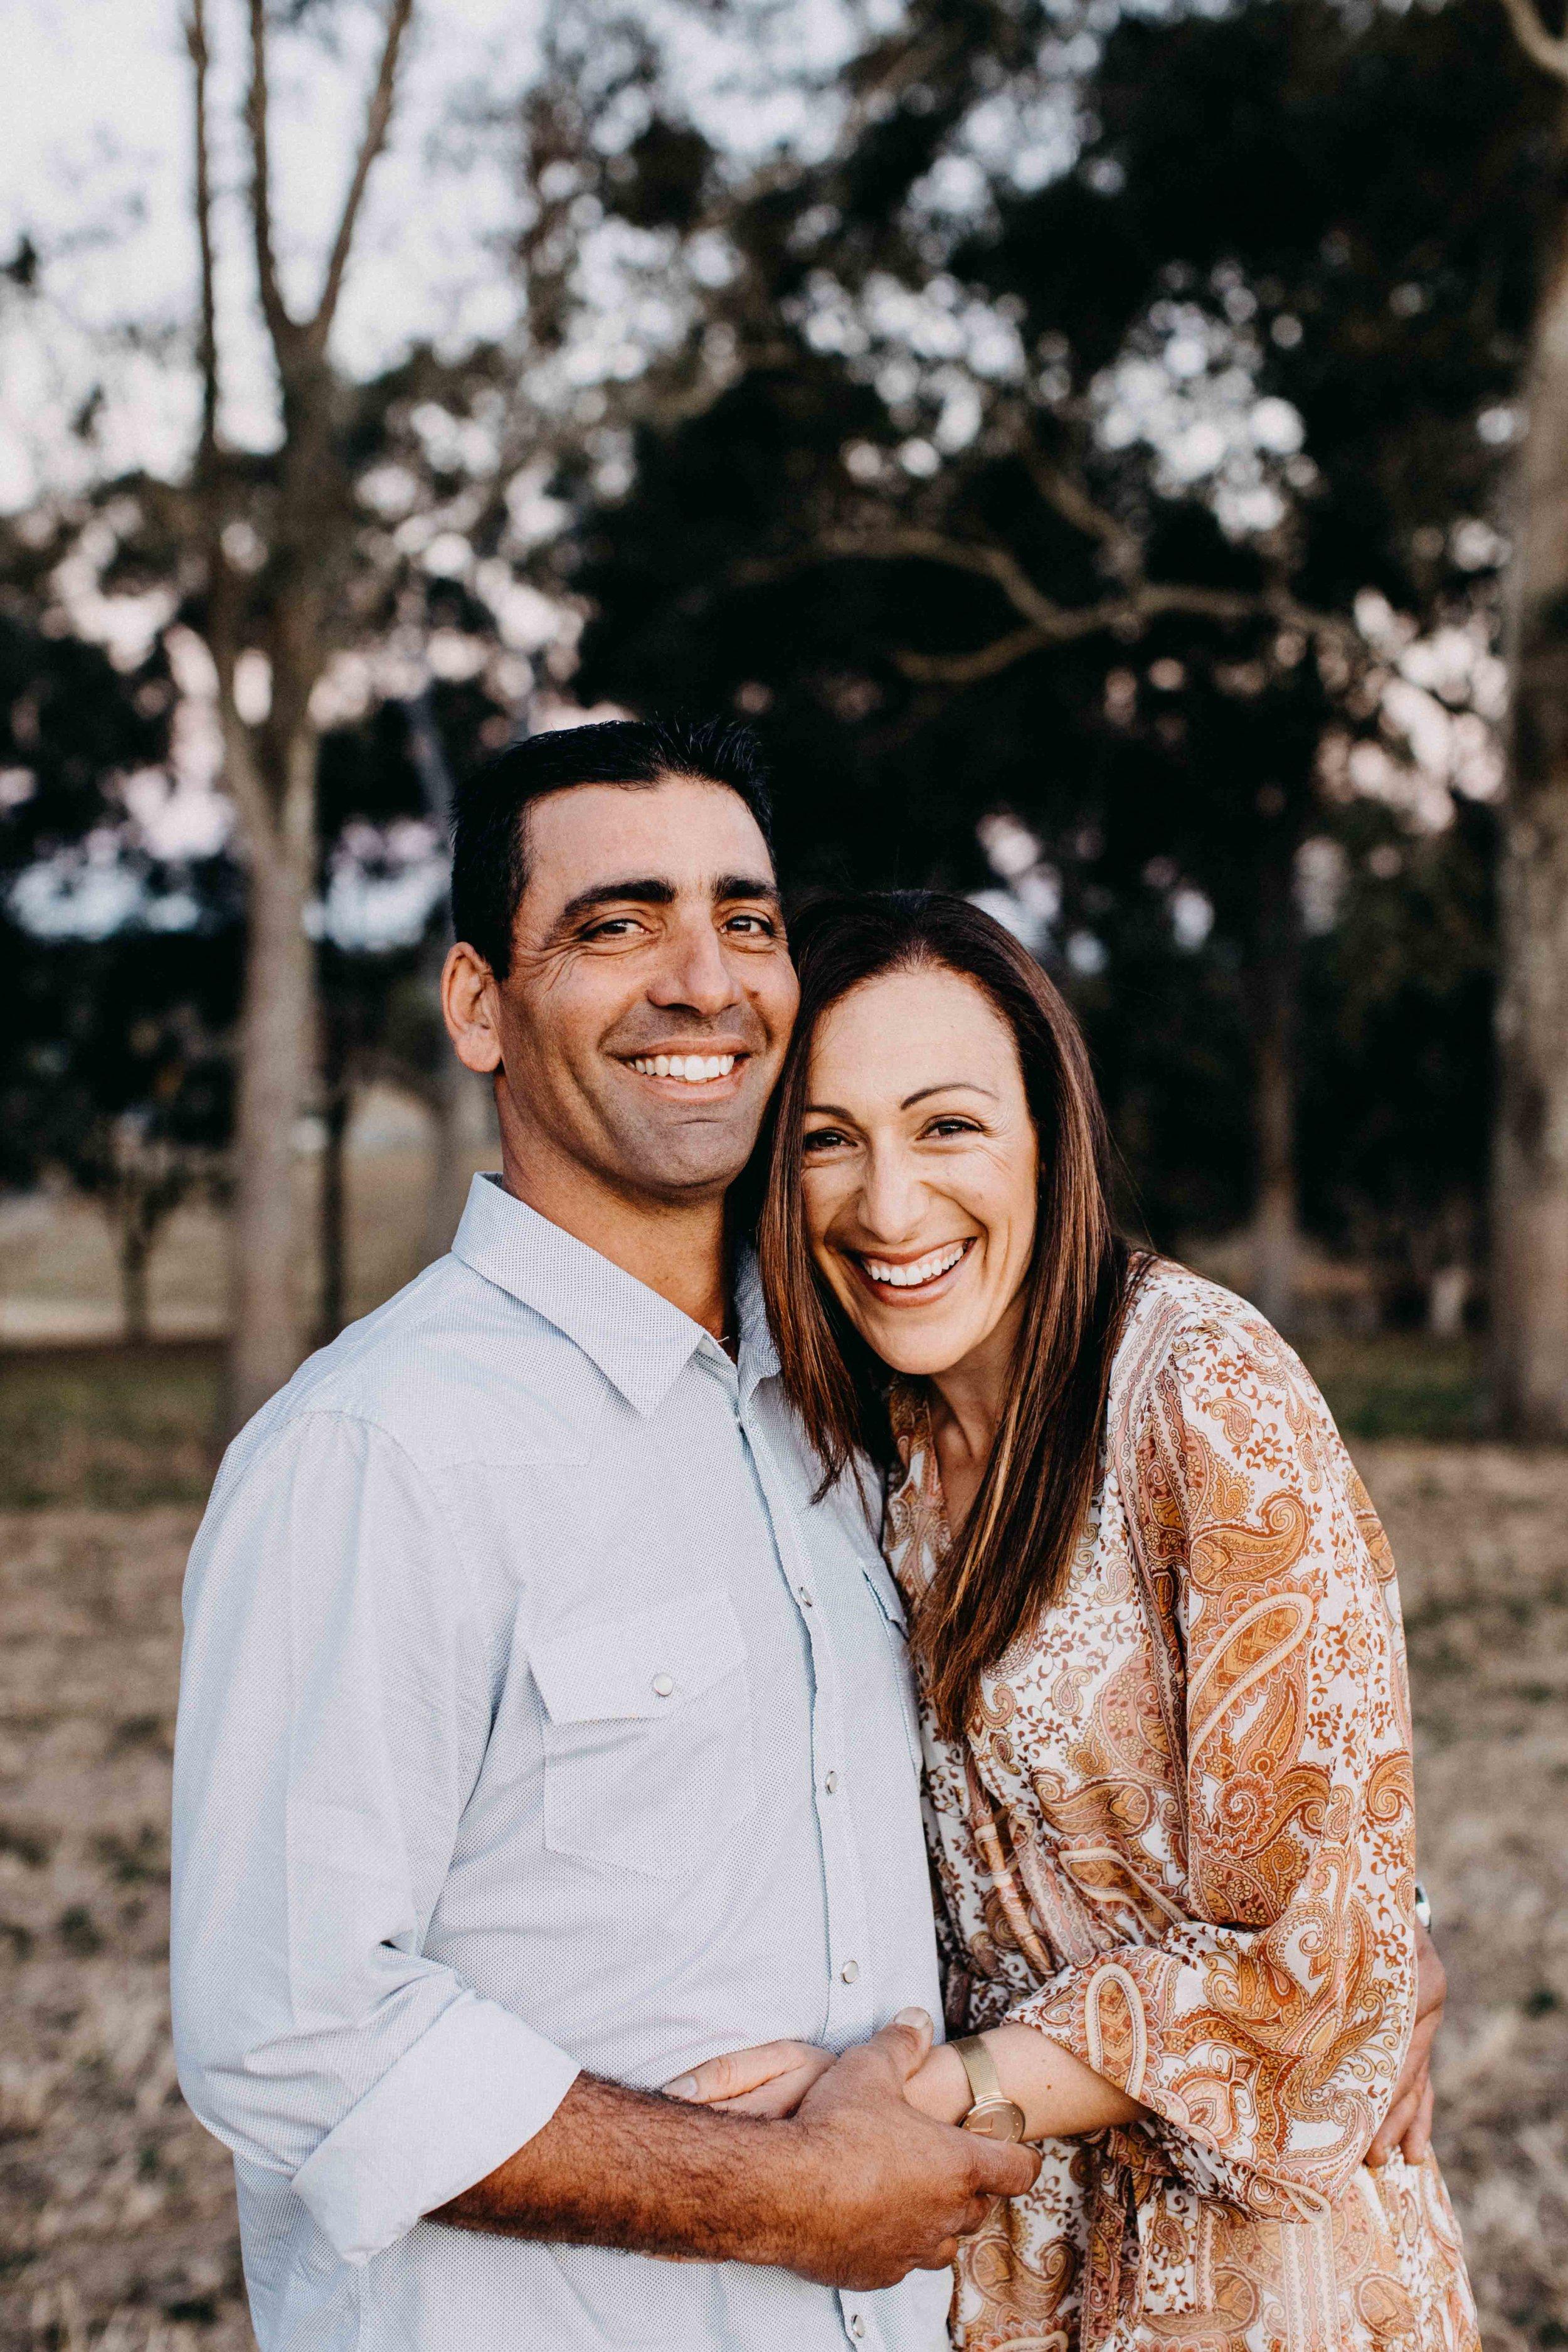 camden-family-photography-galea-www.emilyobrienphotography.net-47.jpg